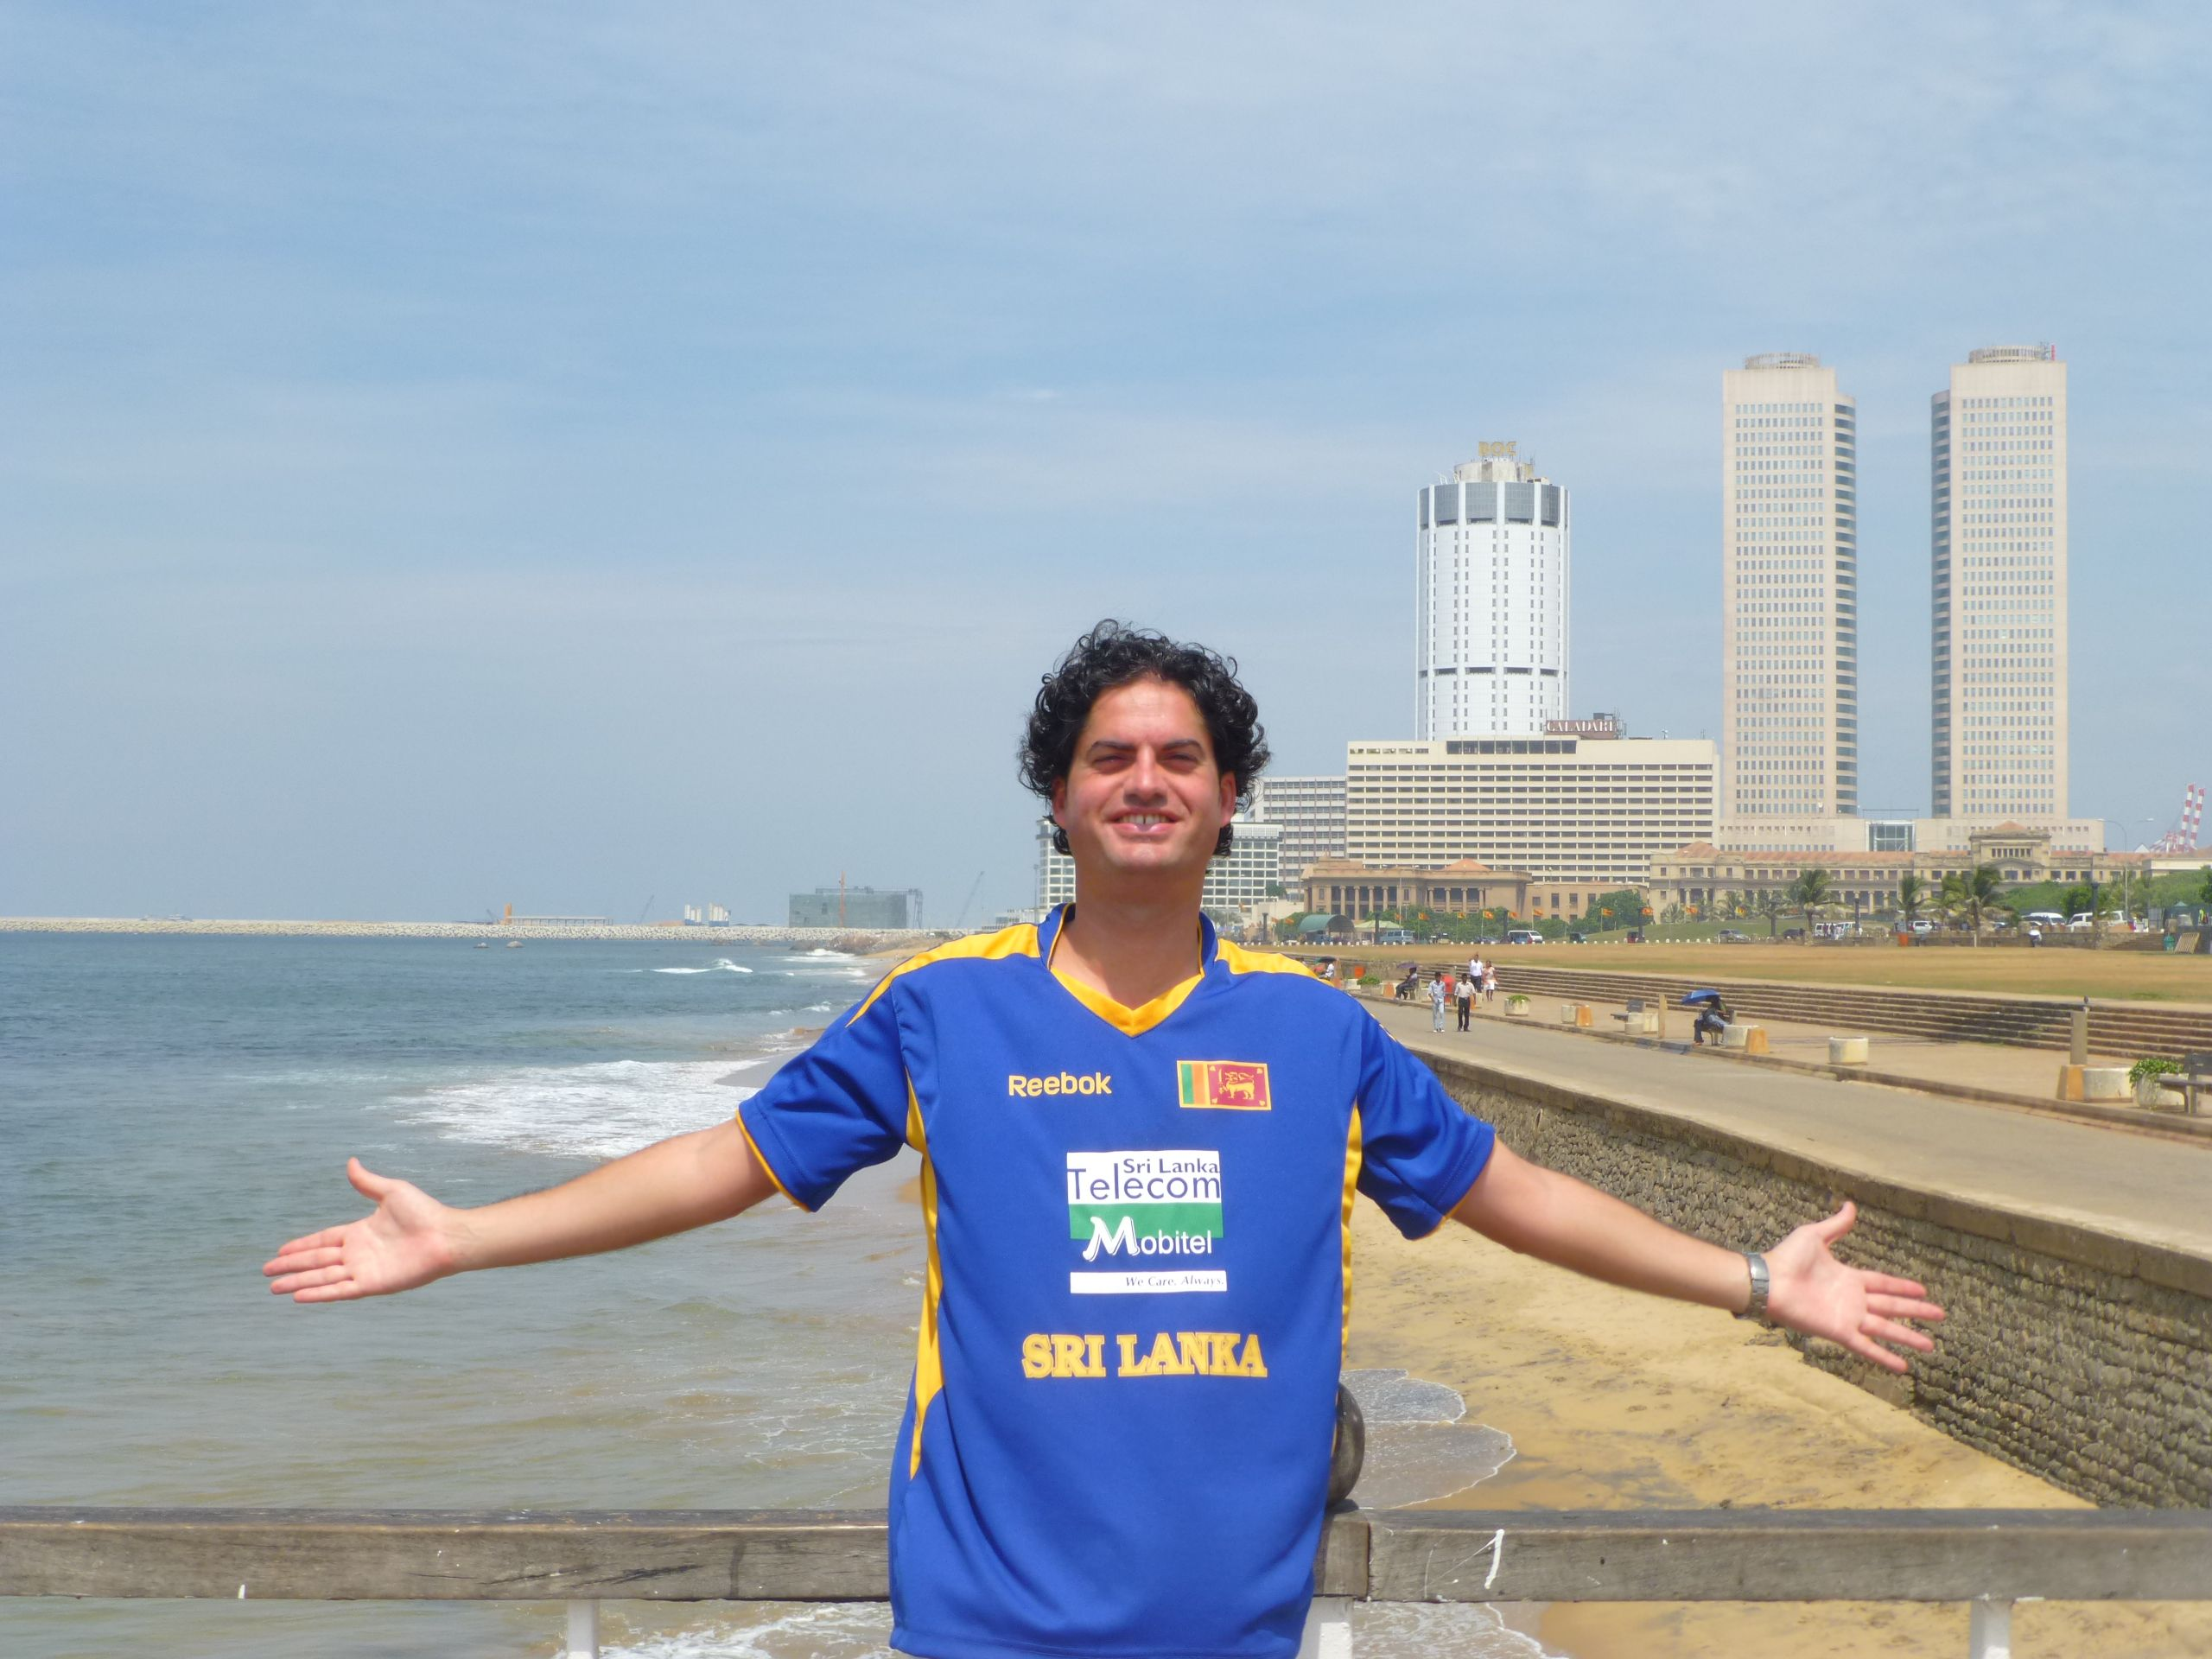 Frédéric Mathieu in Colombo, Sri Lanka (05/02/2013)